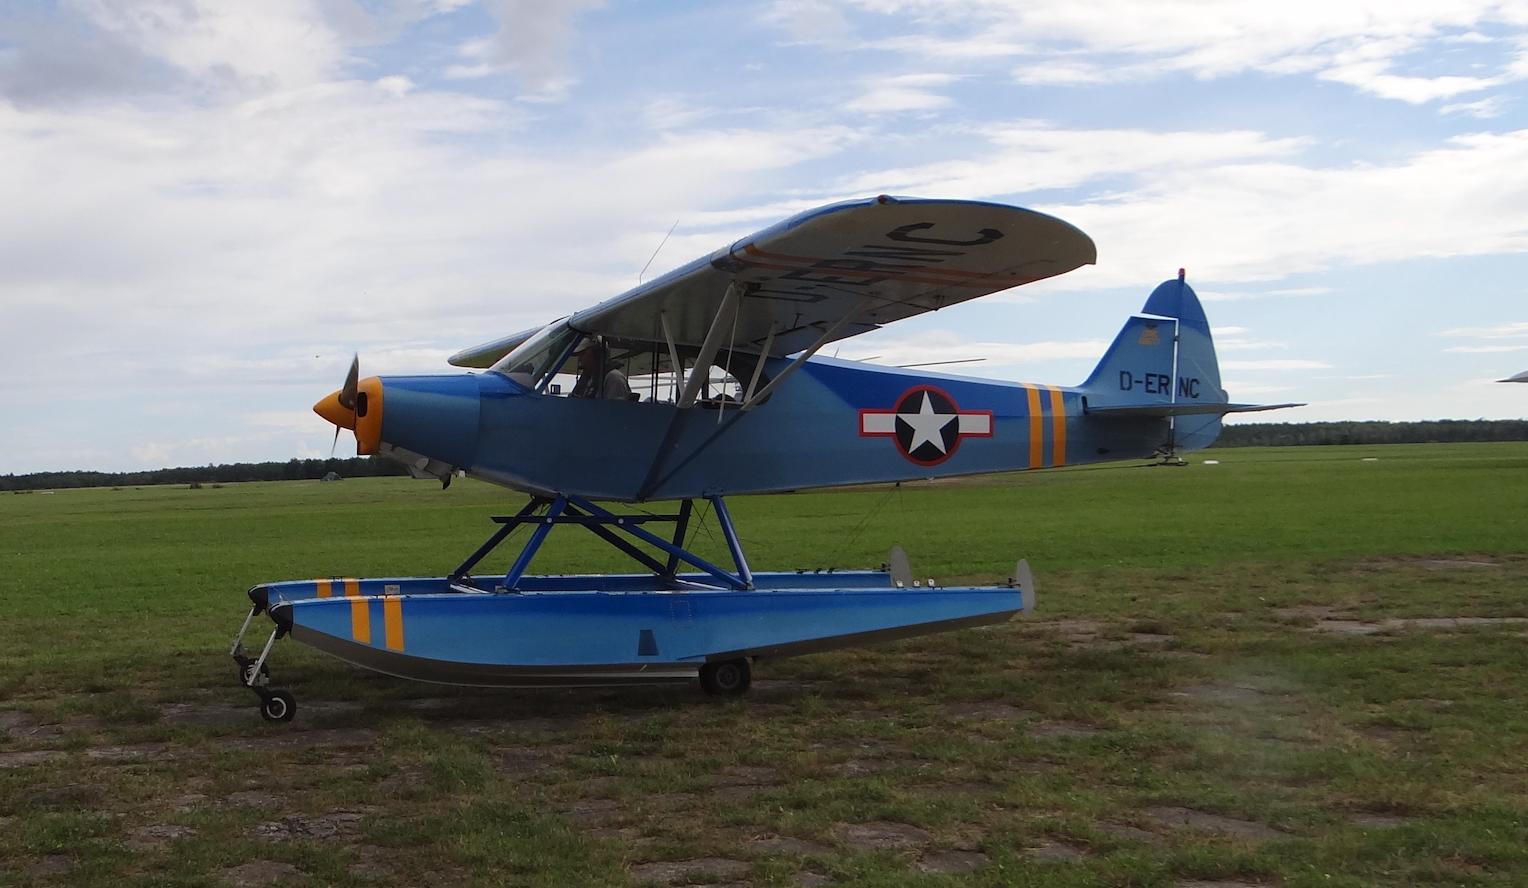 Piper PA-18-150 Super Cub, D-ERNC. 2018 rok. Zdjęcie Karol Placha Hetman